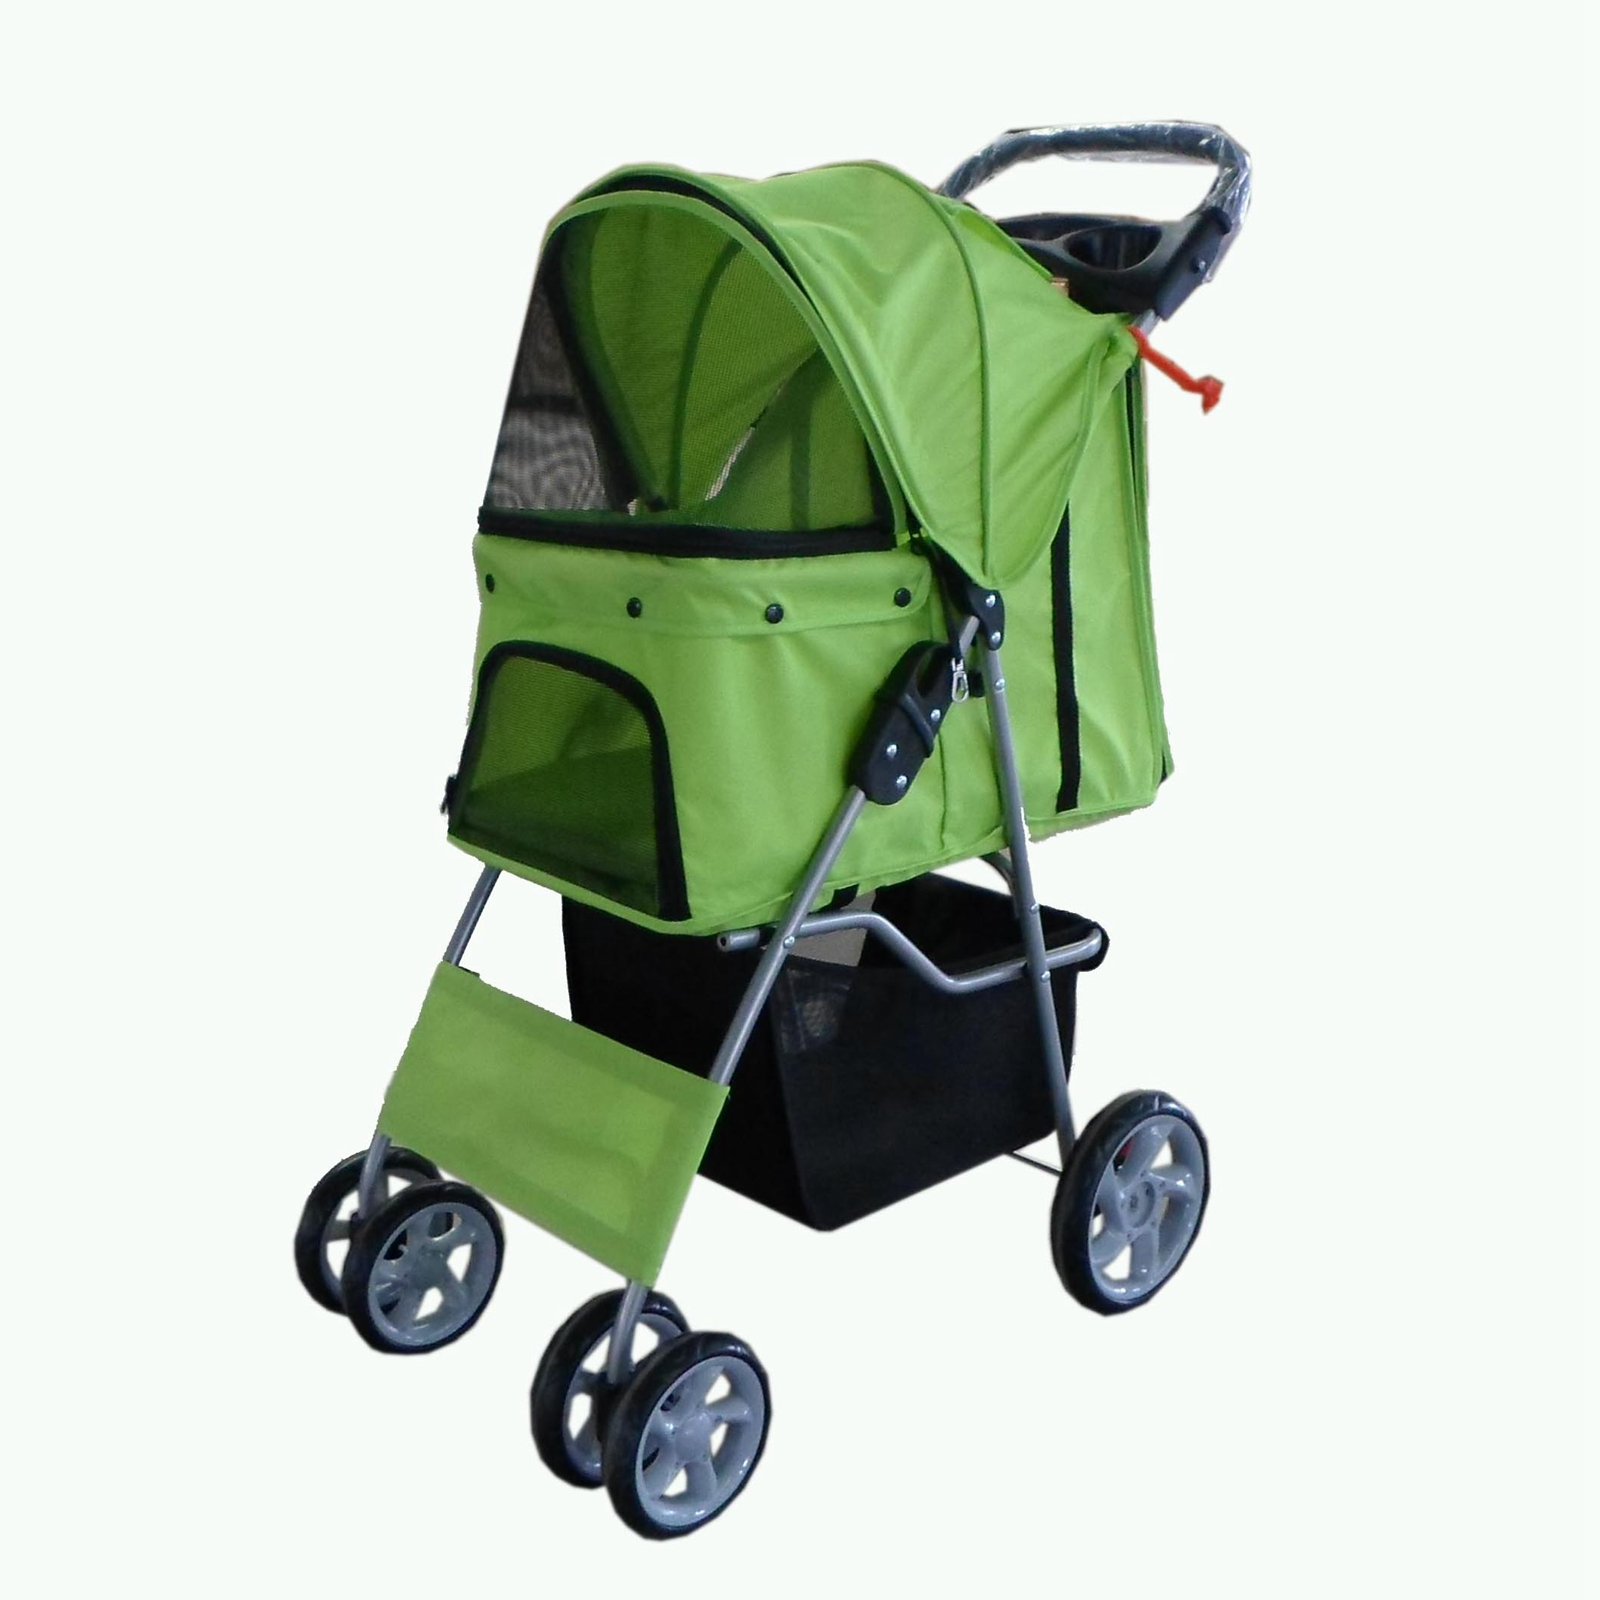 Folding Ultralight Mother child Pet Stroller/Dual Layers